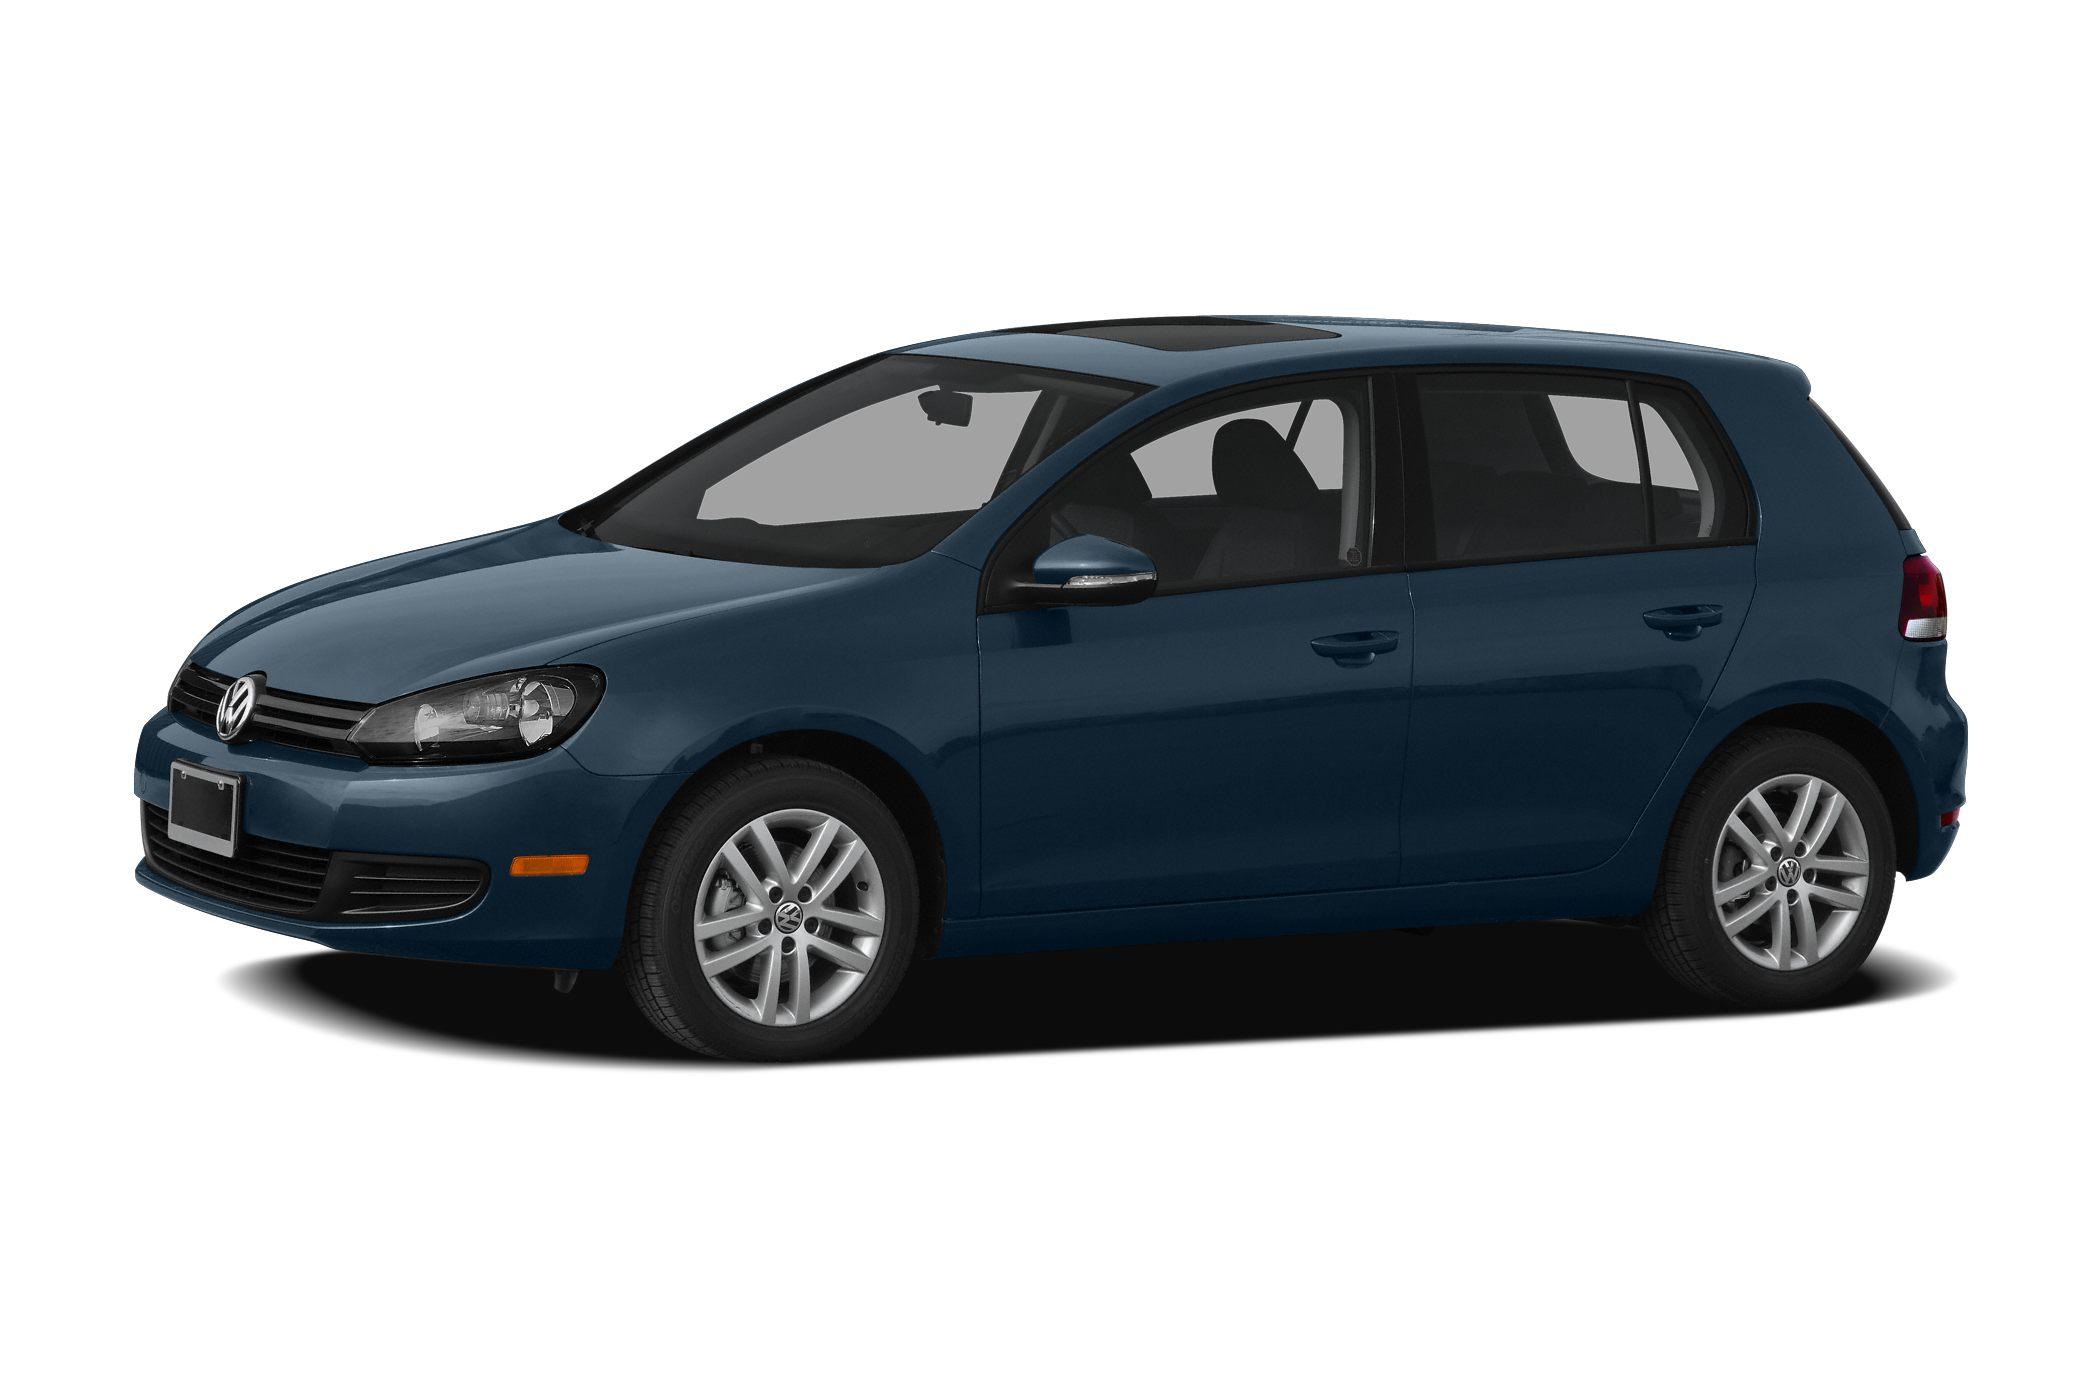 2011 Volkswagen Golf TDI 4-Door 20L 4-Cylinder TDI Turbocharged 140 hp Black Clean CARFAX Recen